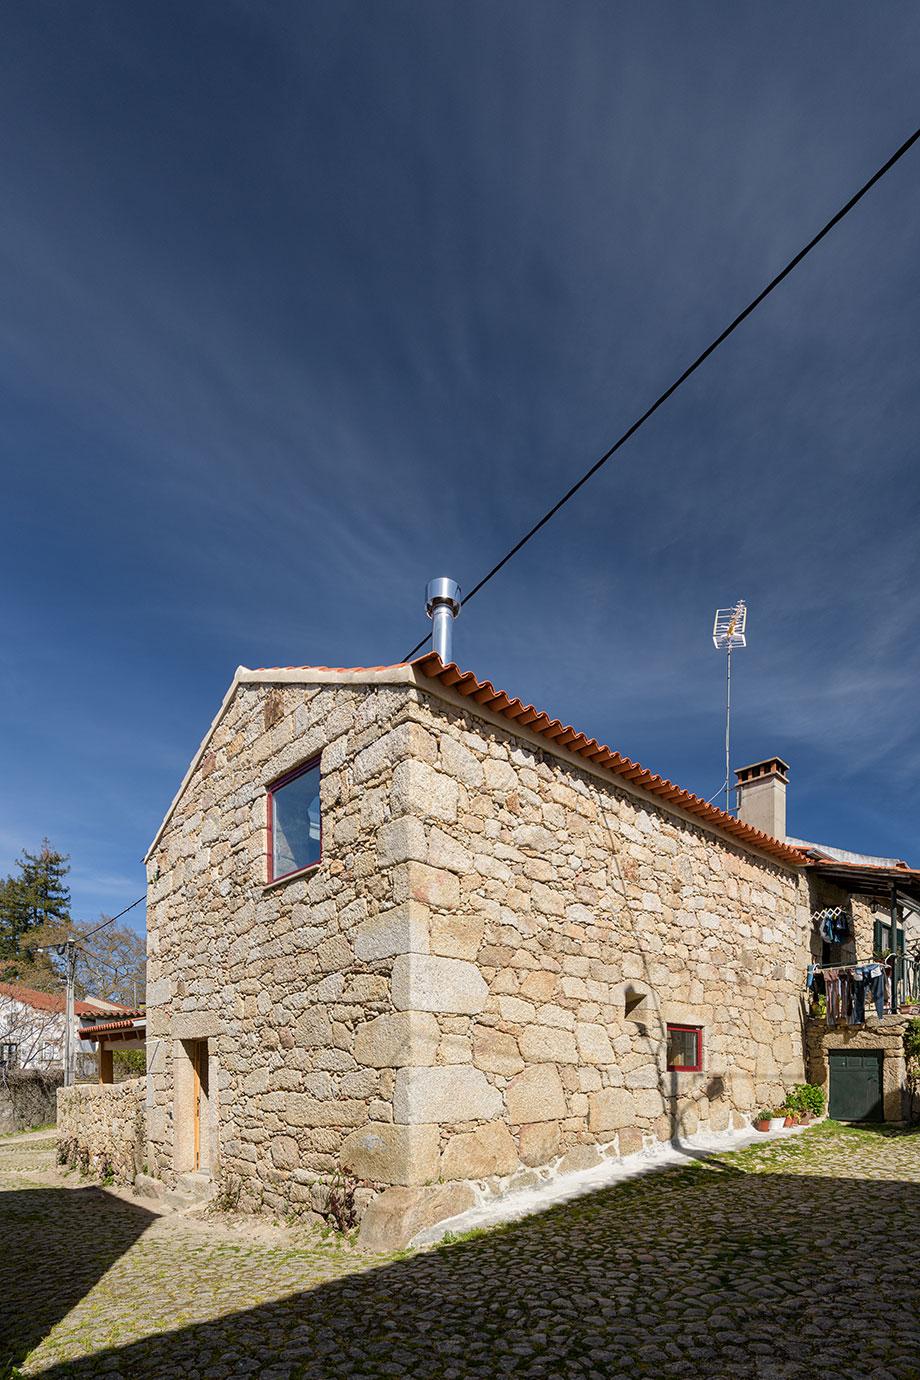 casa rural en portugal de hbg architects (19) - foto ricardo oliveira alves